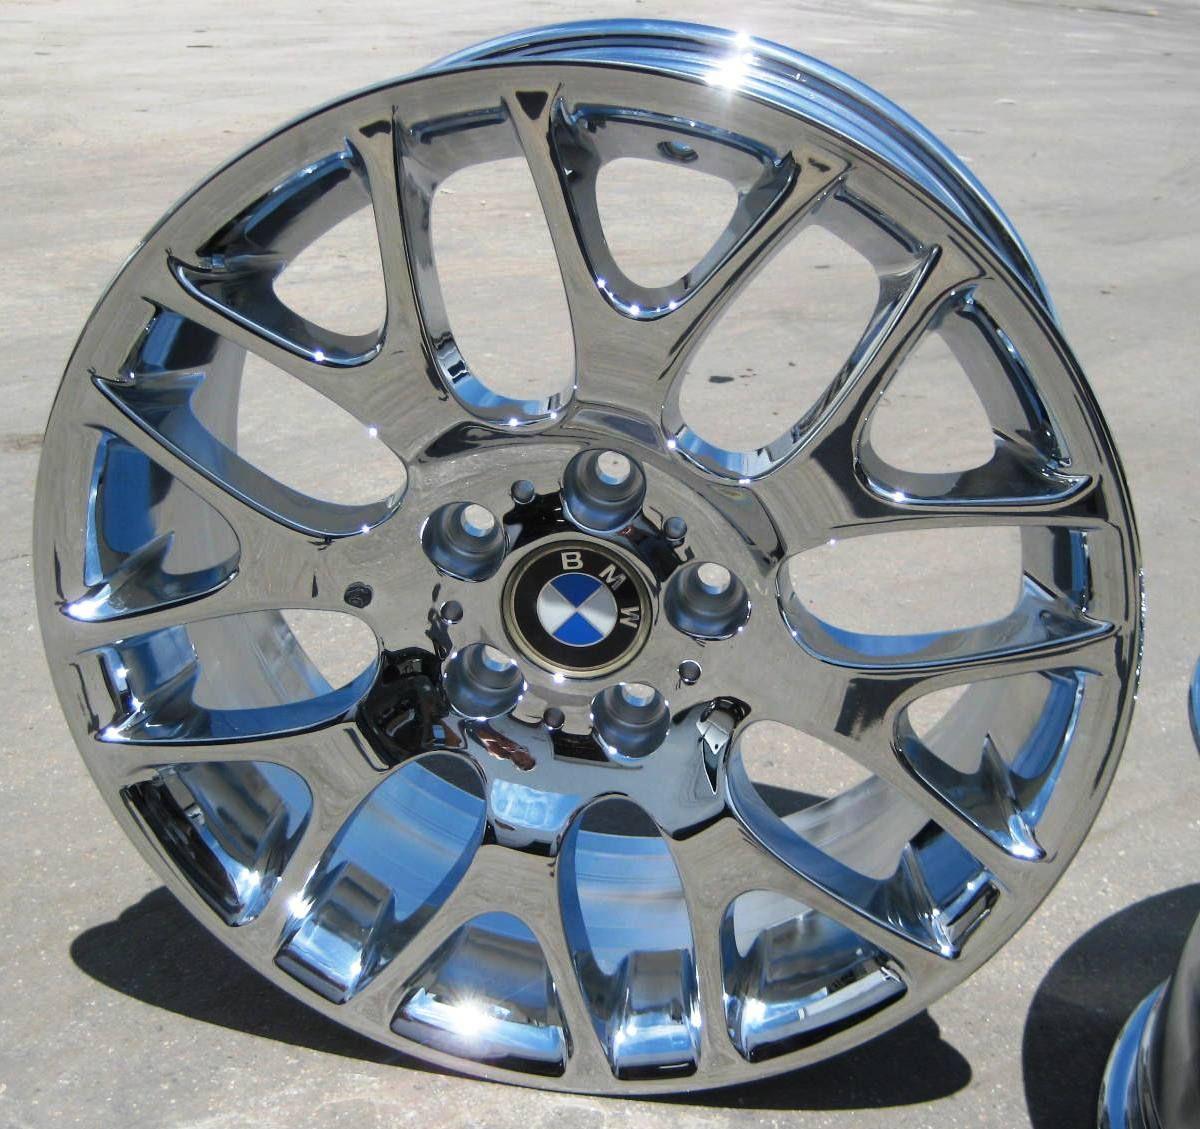 BMW 328i 330i 335i M3 325i E90 Chrome Wheels Rims Set of 4